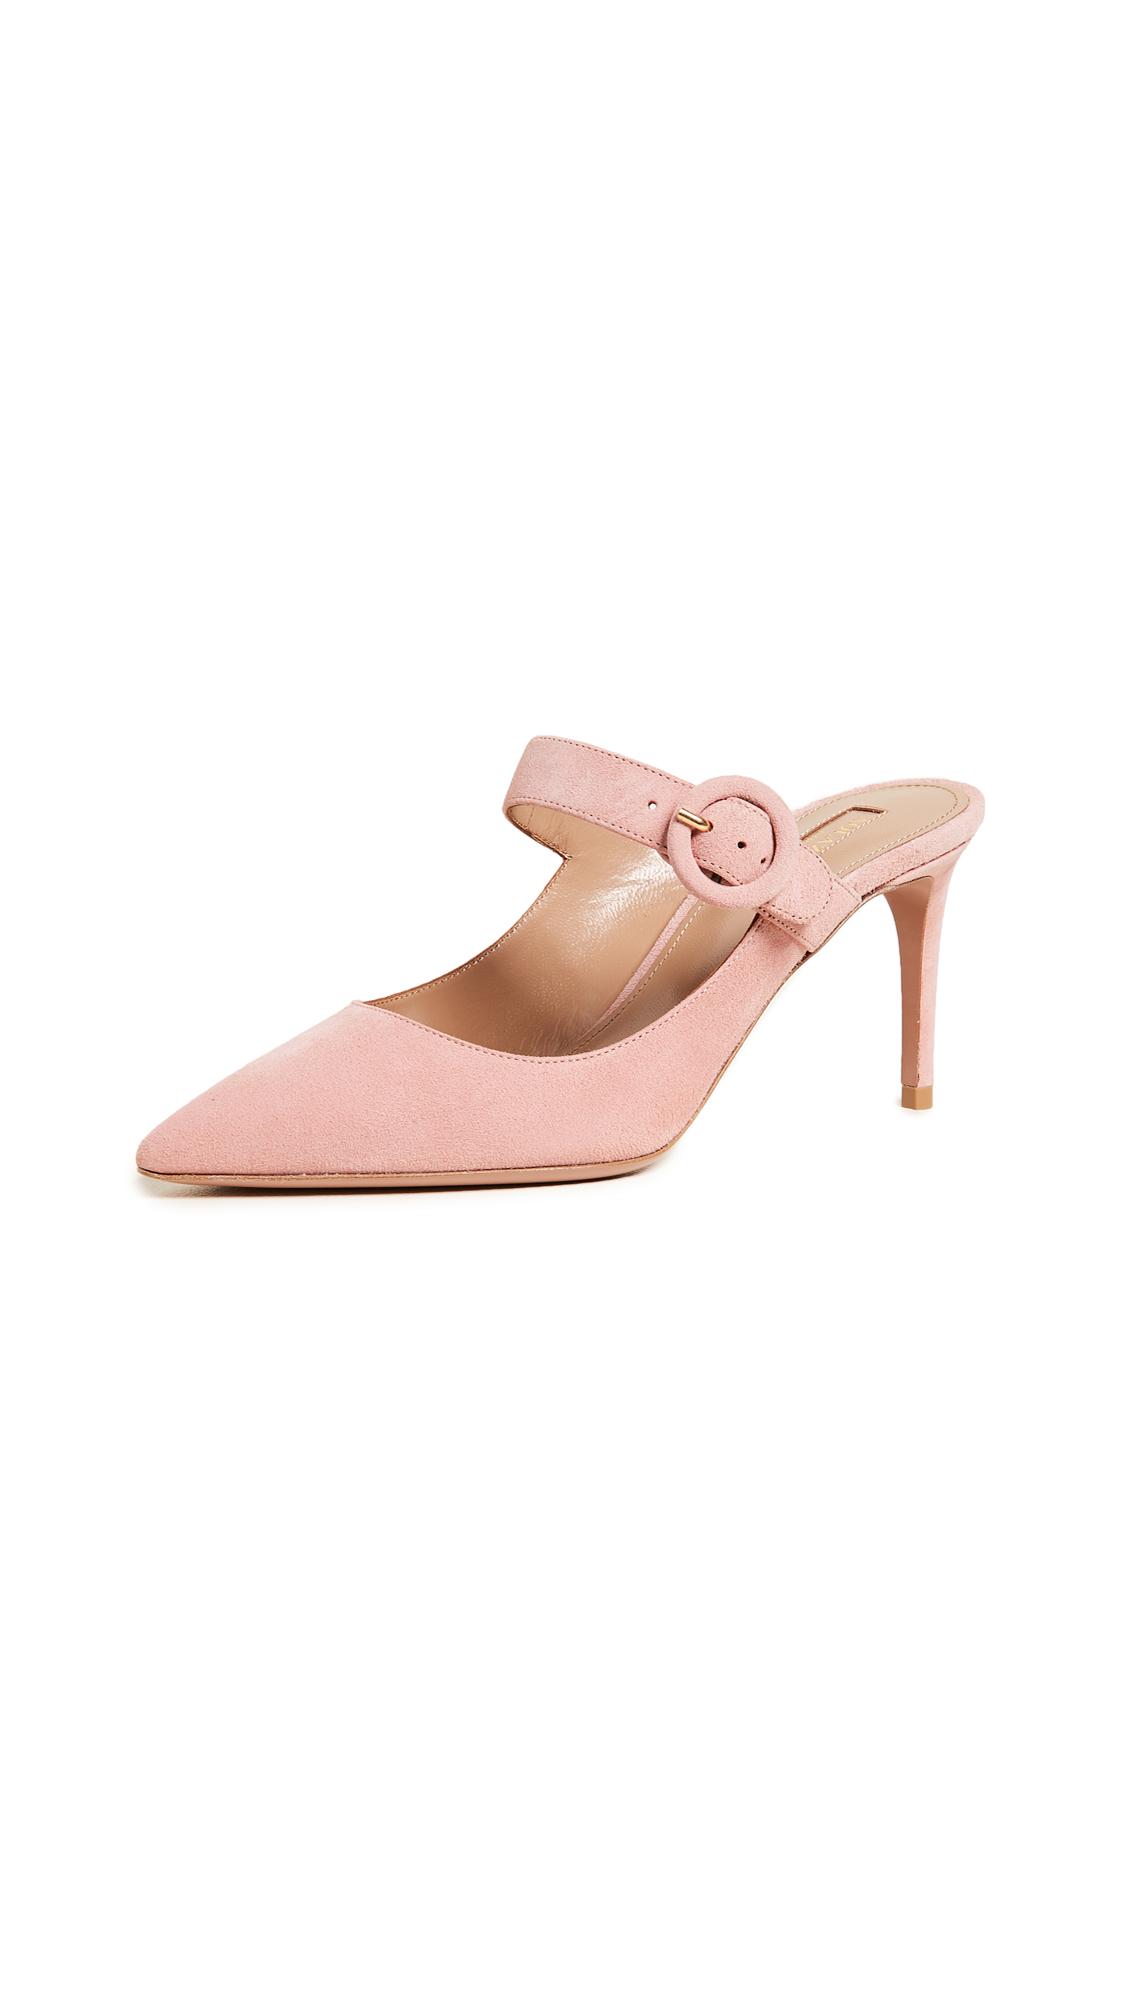 Aquazzura Blossom Mules - Jaipur Pink